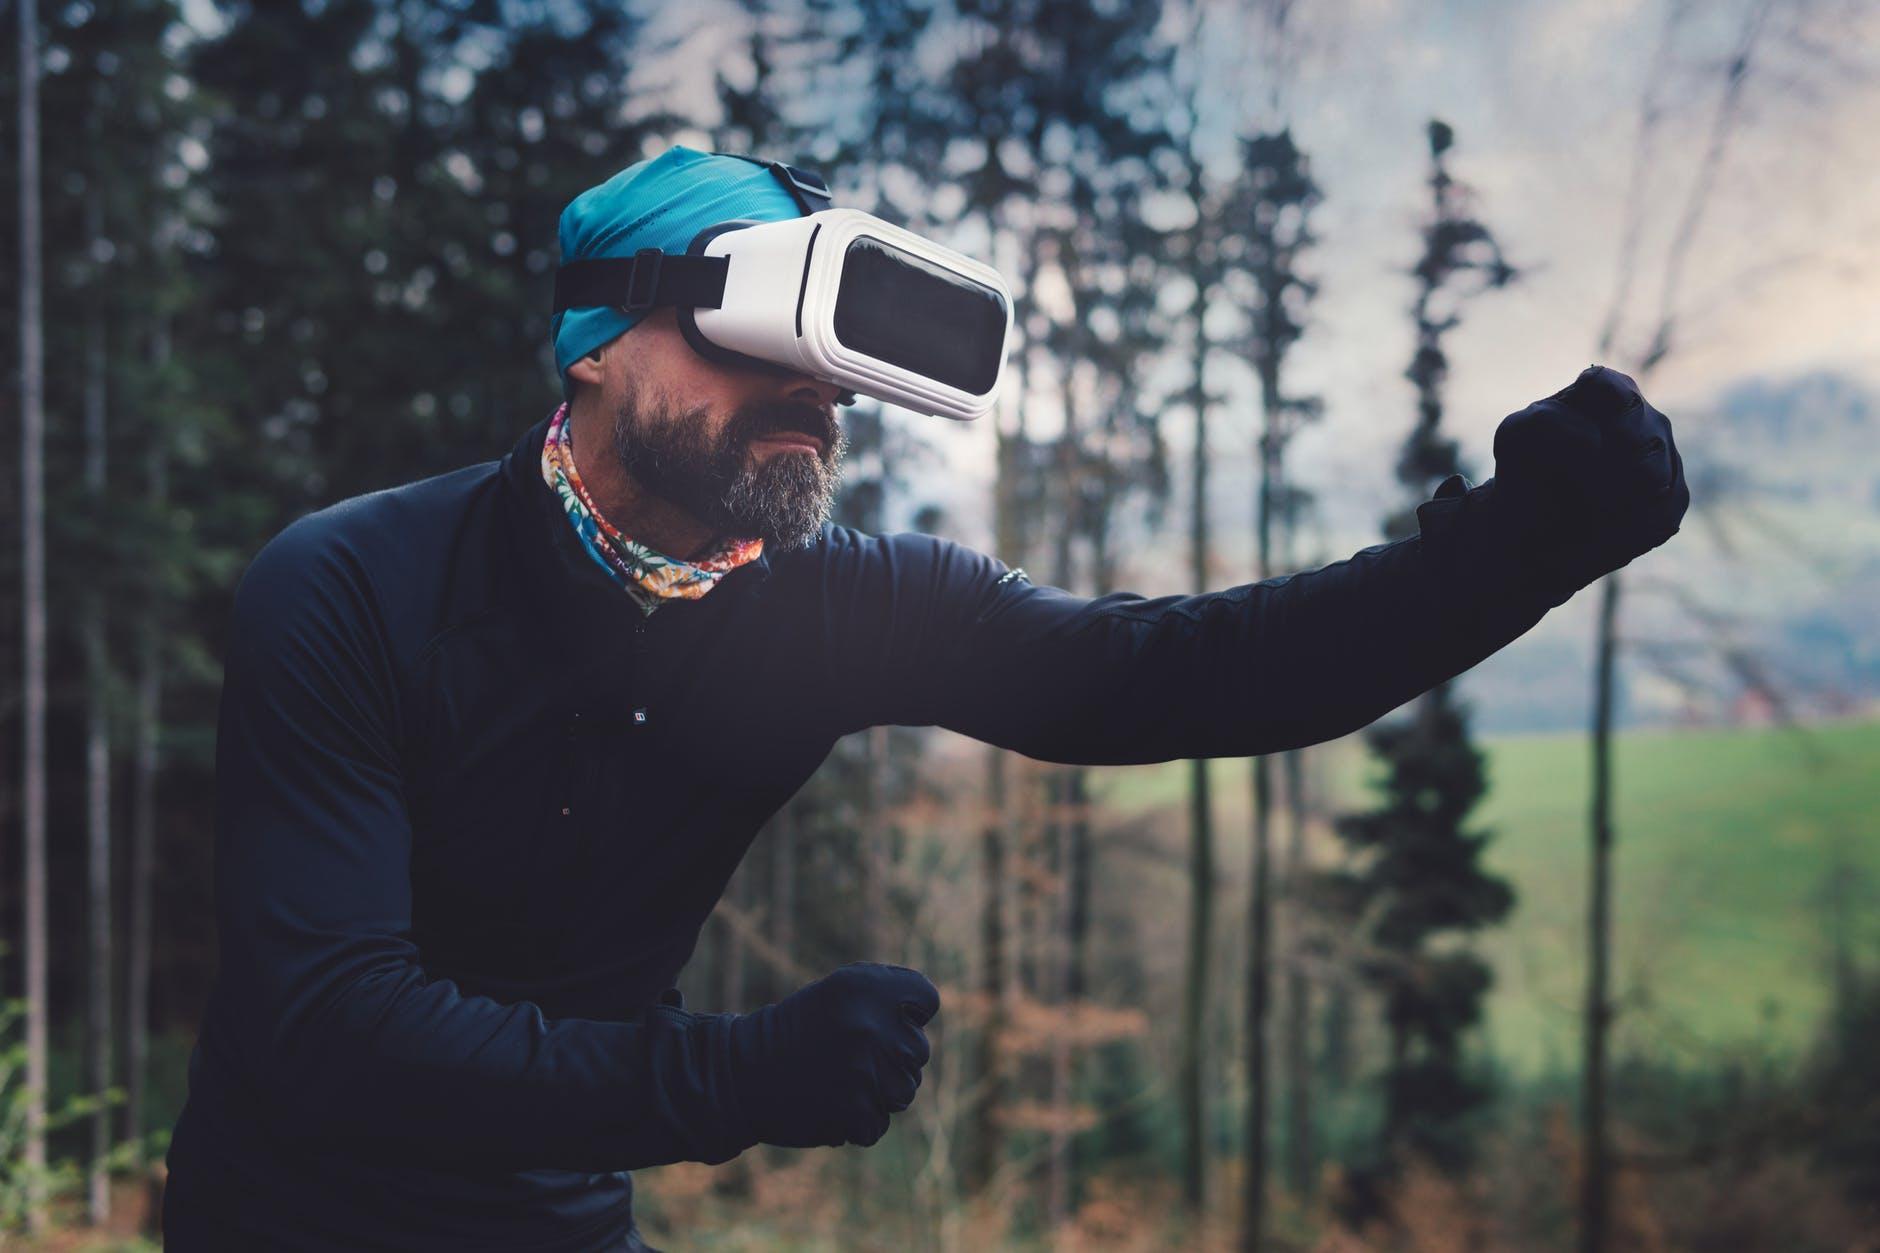 virtual reality, virtual reality technology, virtual reality industry, virtual reality gaming, vr gaming, vr technology, vr gaming technology